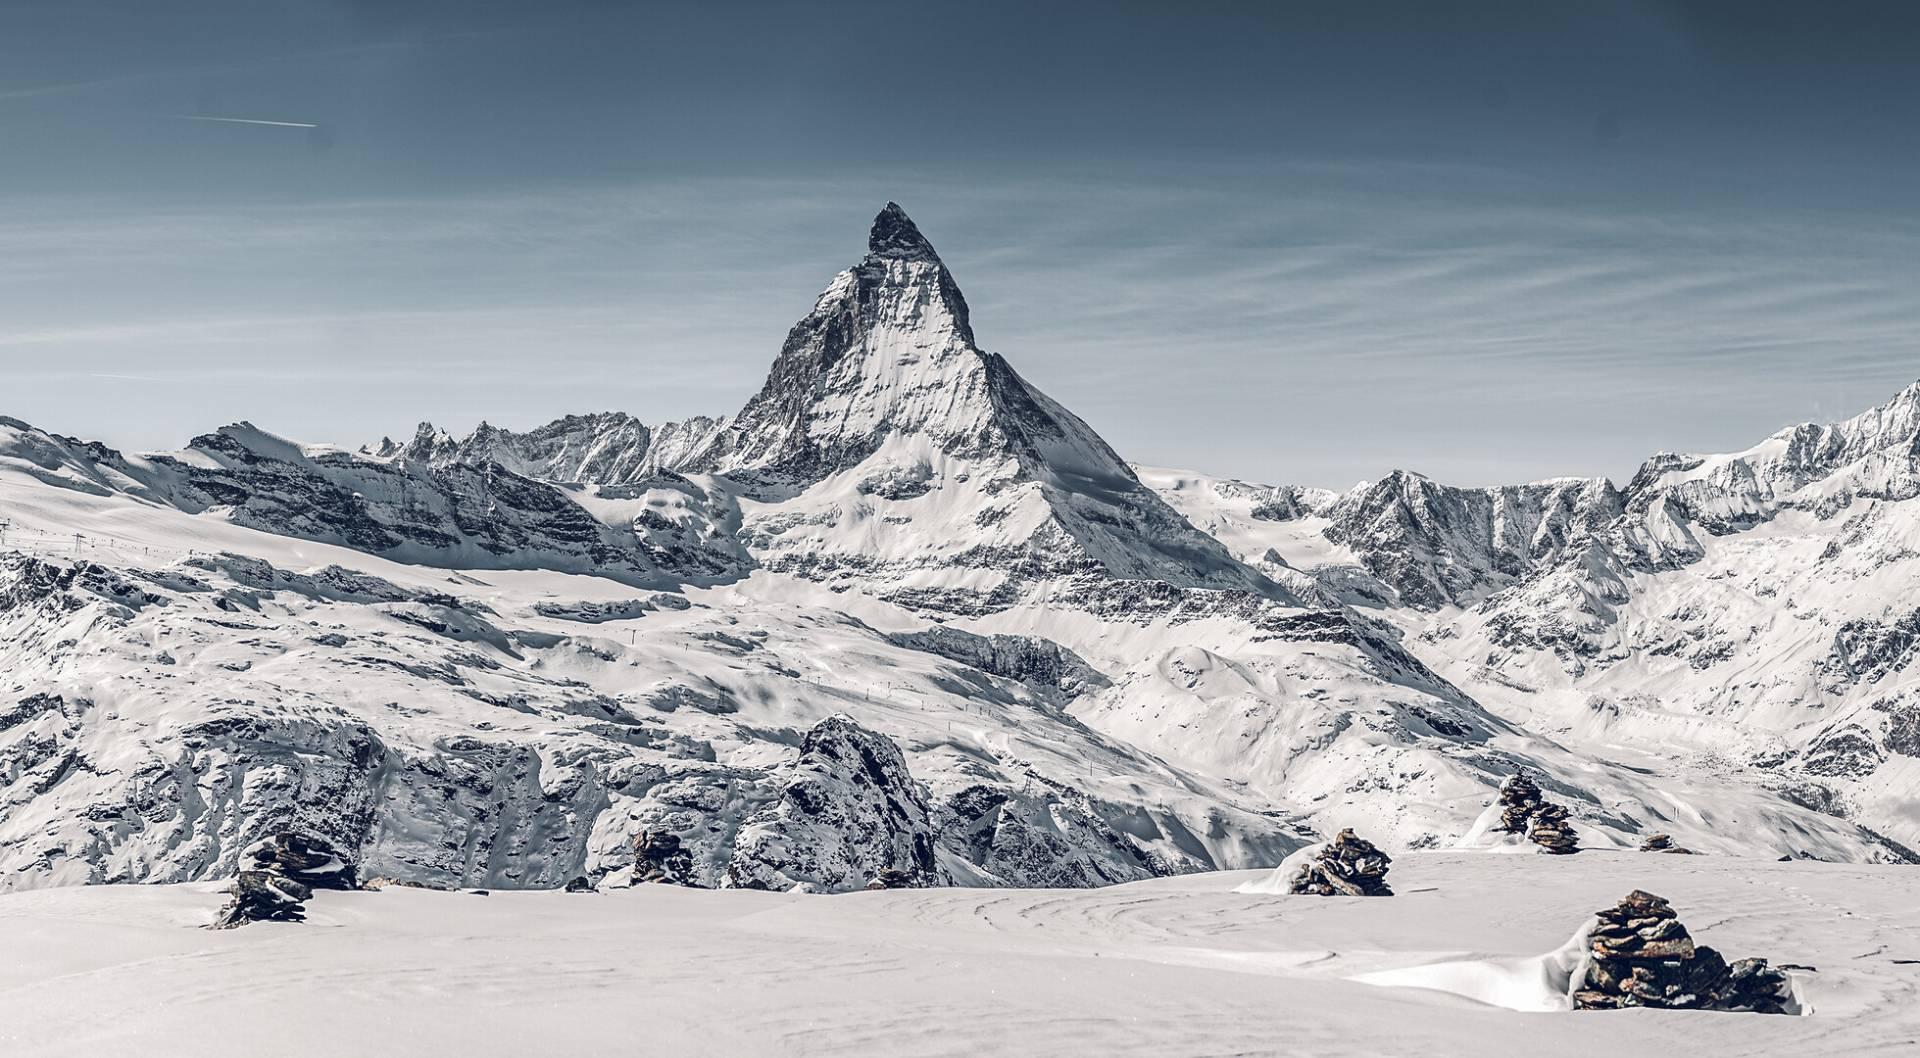 Matterhorn view from Gornergrat in winter